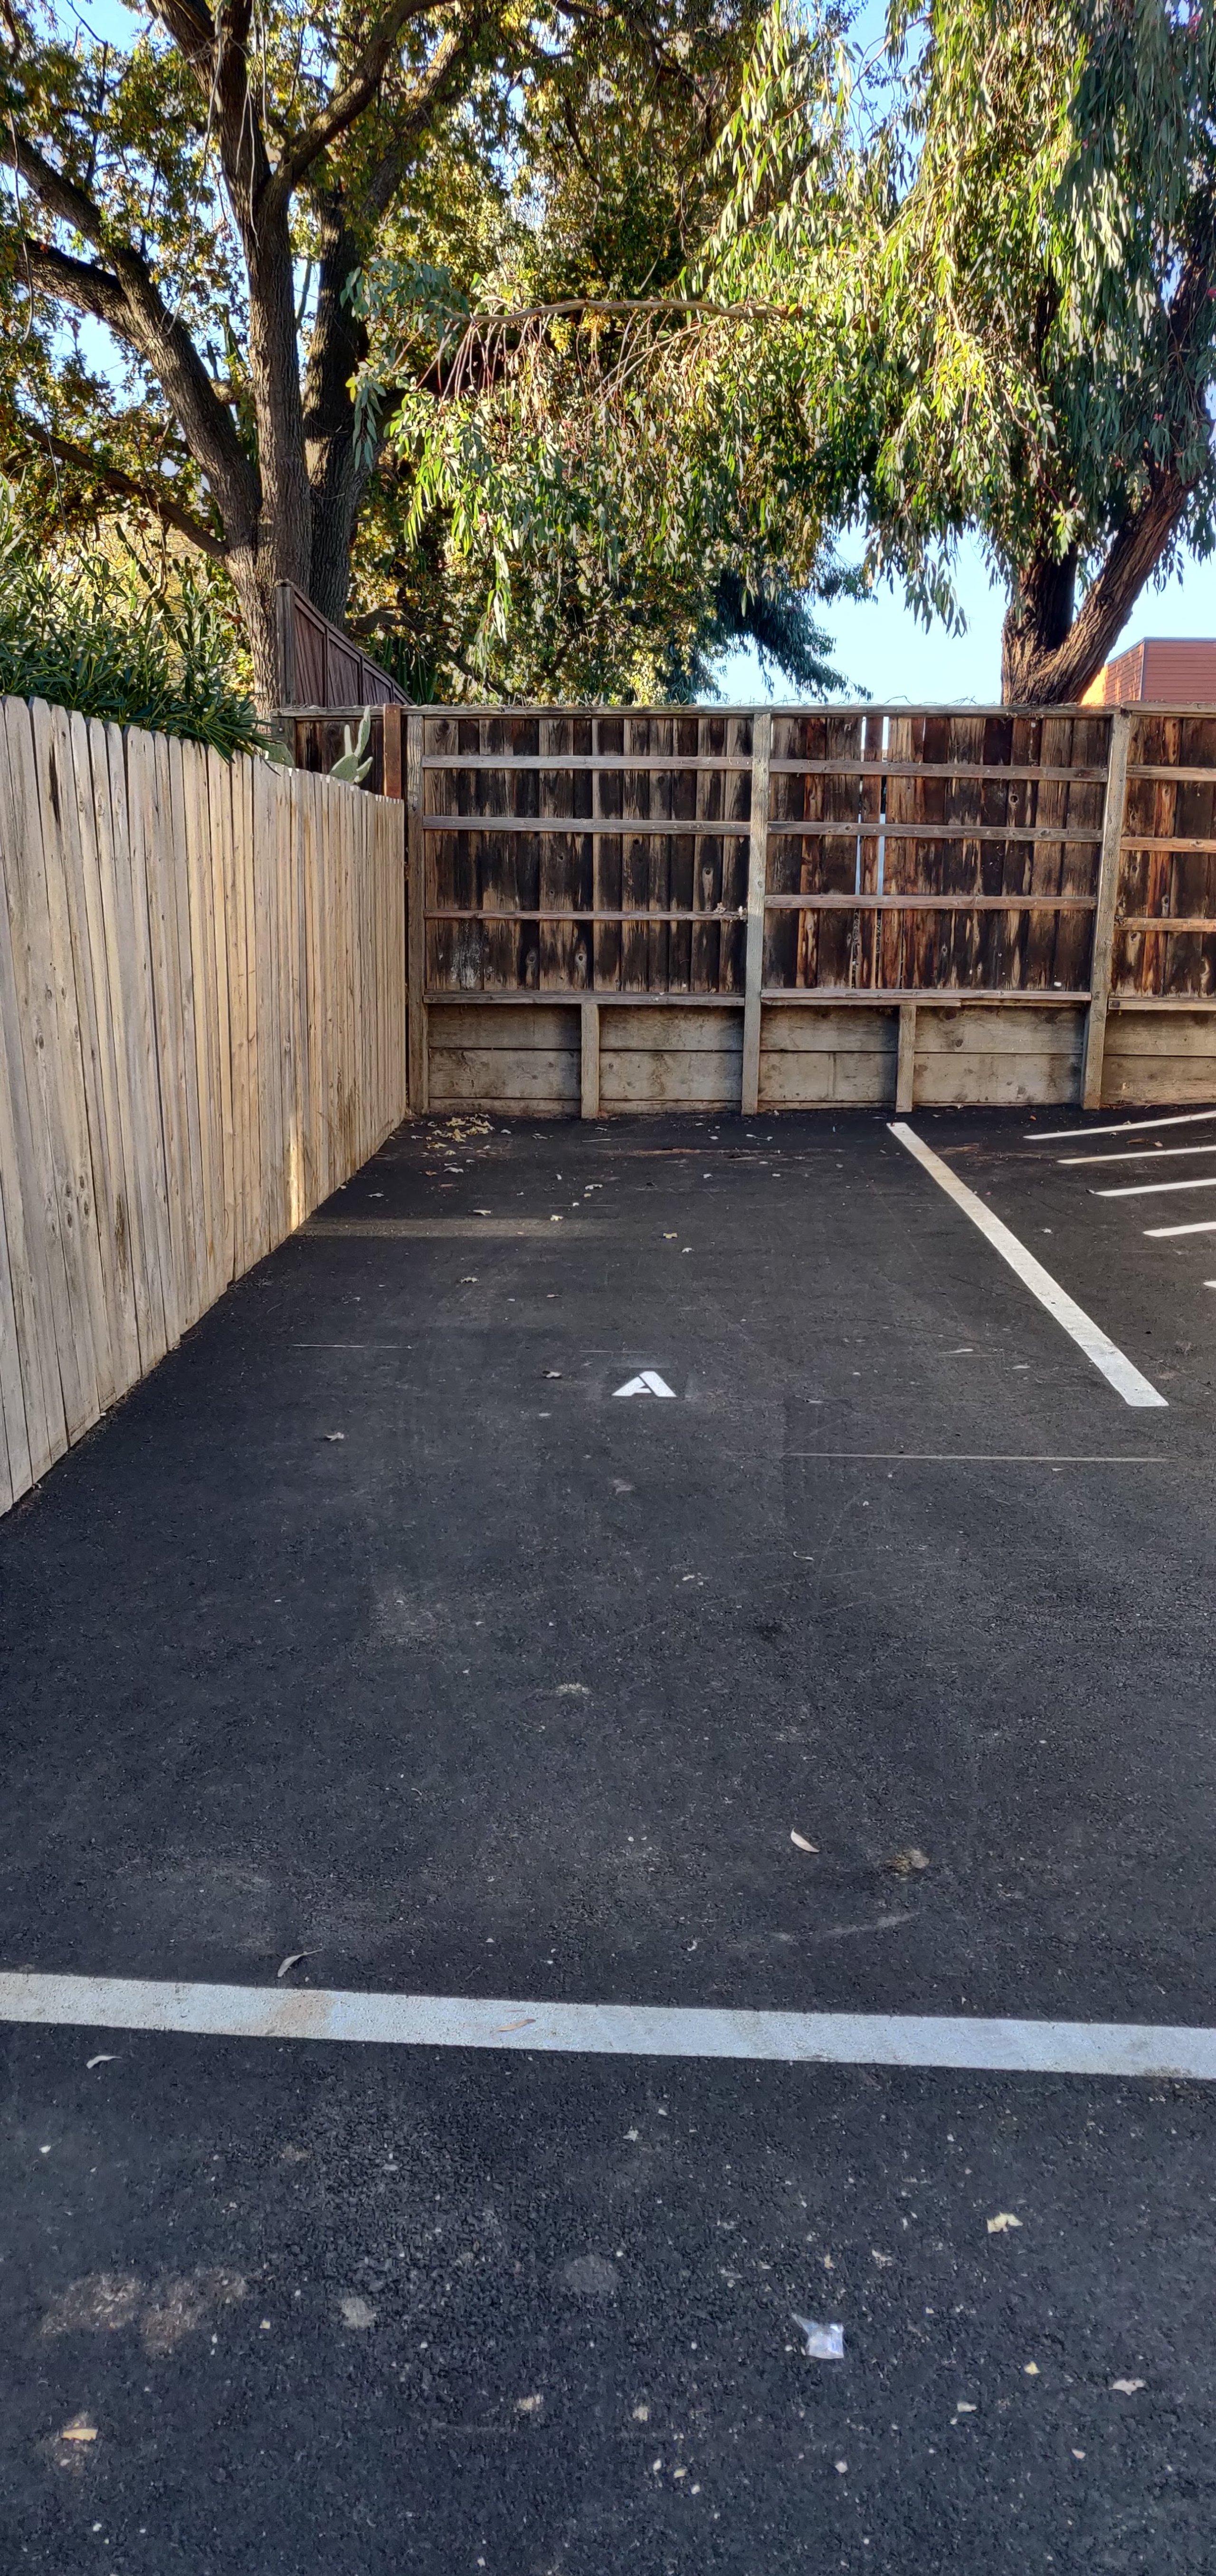 20x20 Parking Lot self storage unit